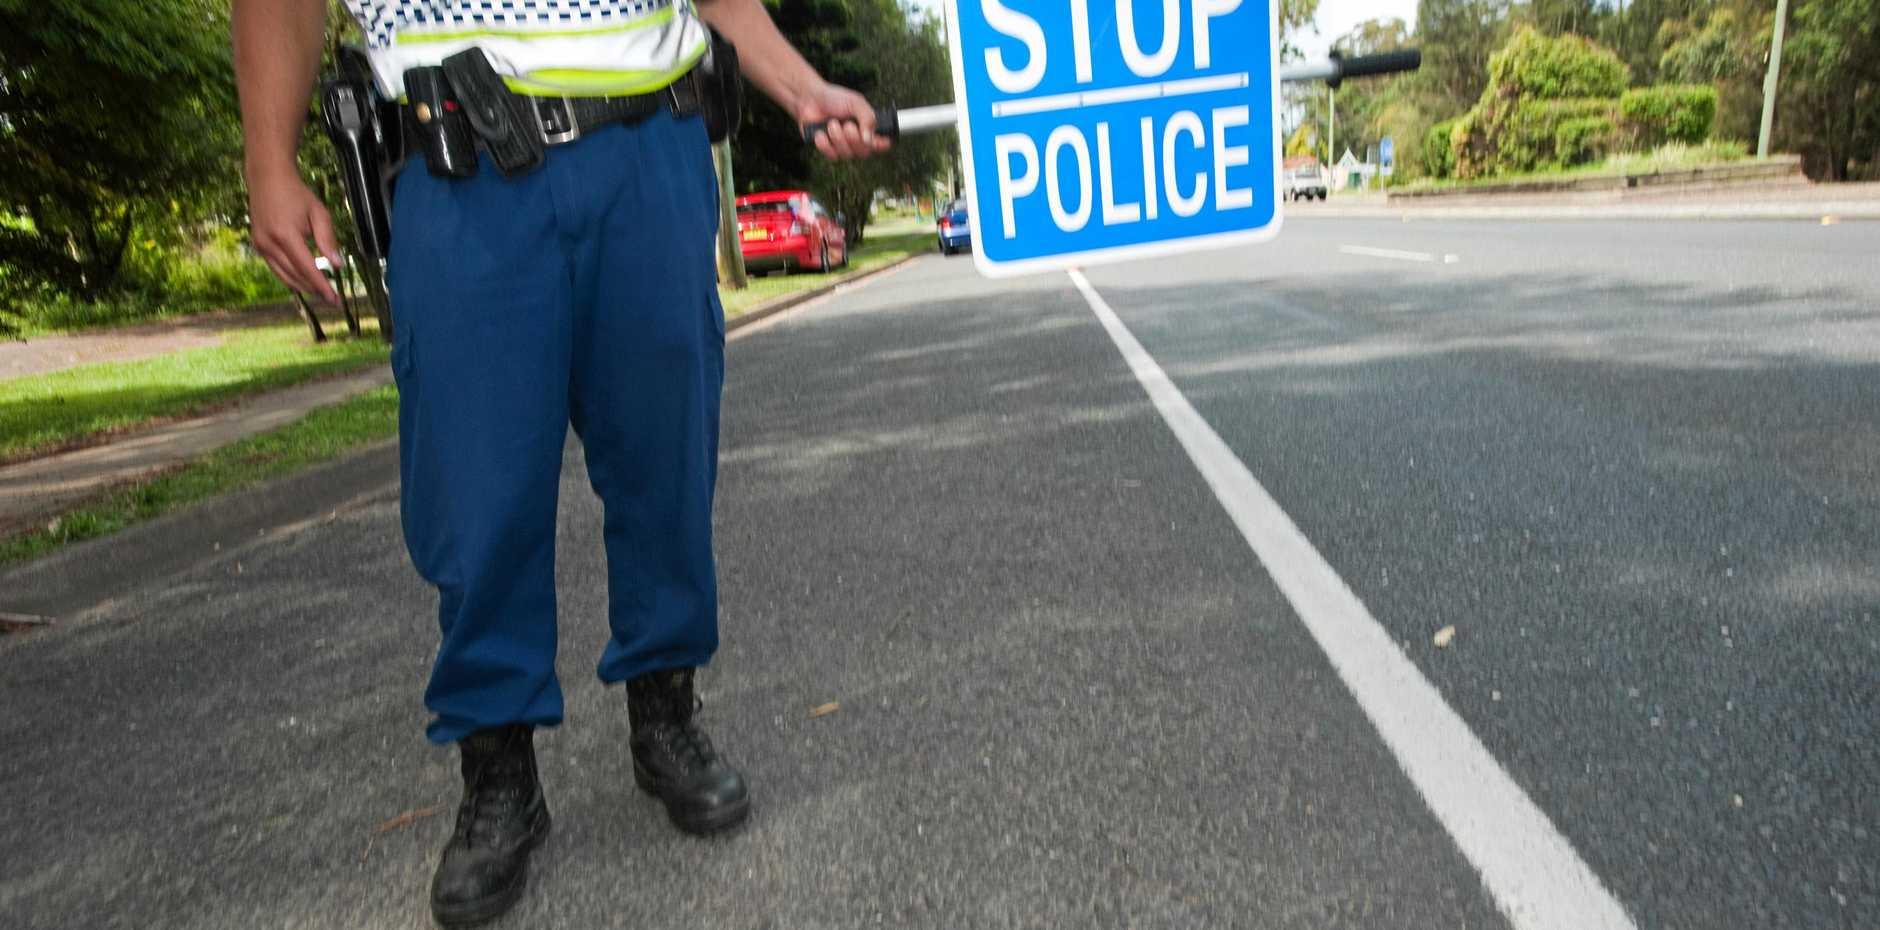 Police random breath test site in Coffs Harbour.